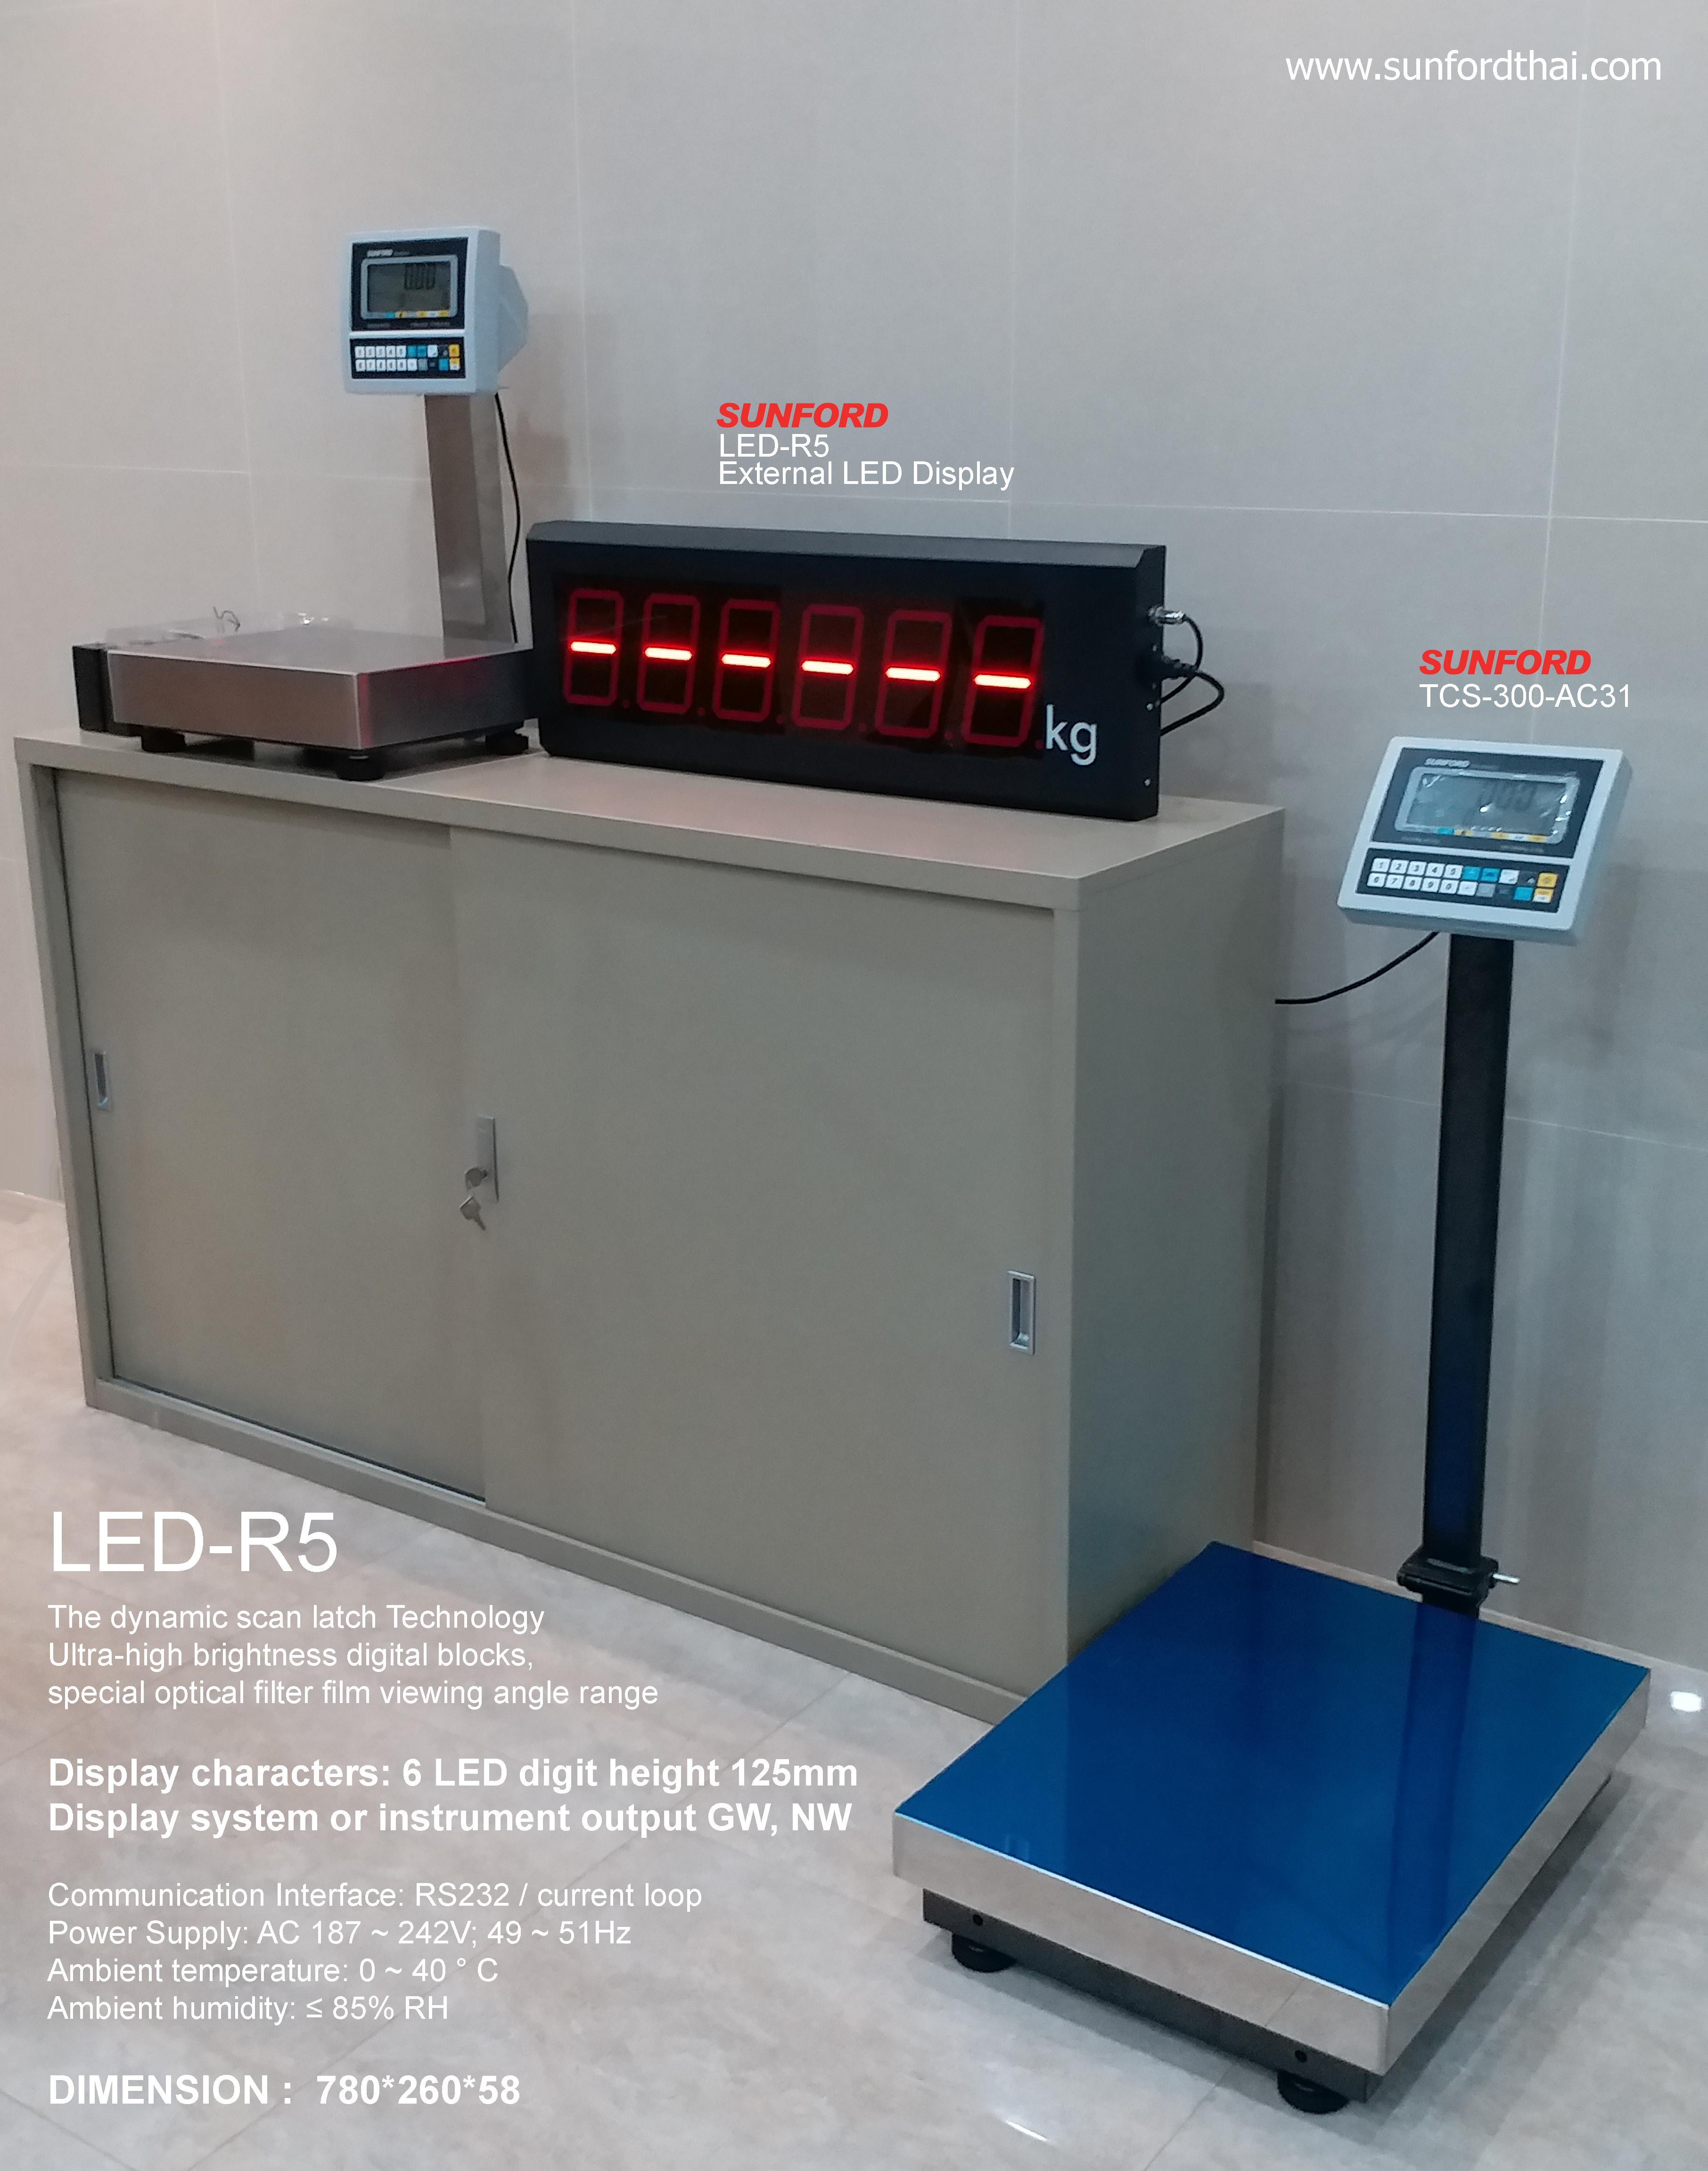 SUNFORD TCS-300AW31 พร้อมจอเสริม LED-R5